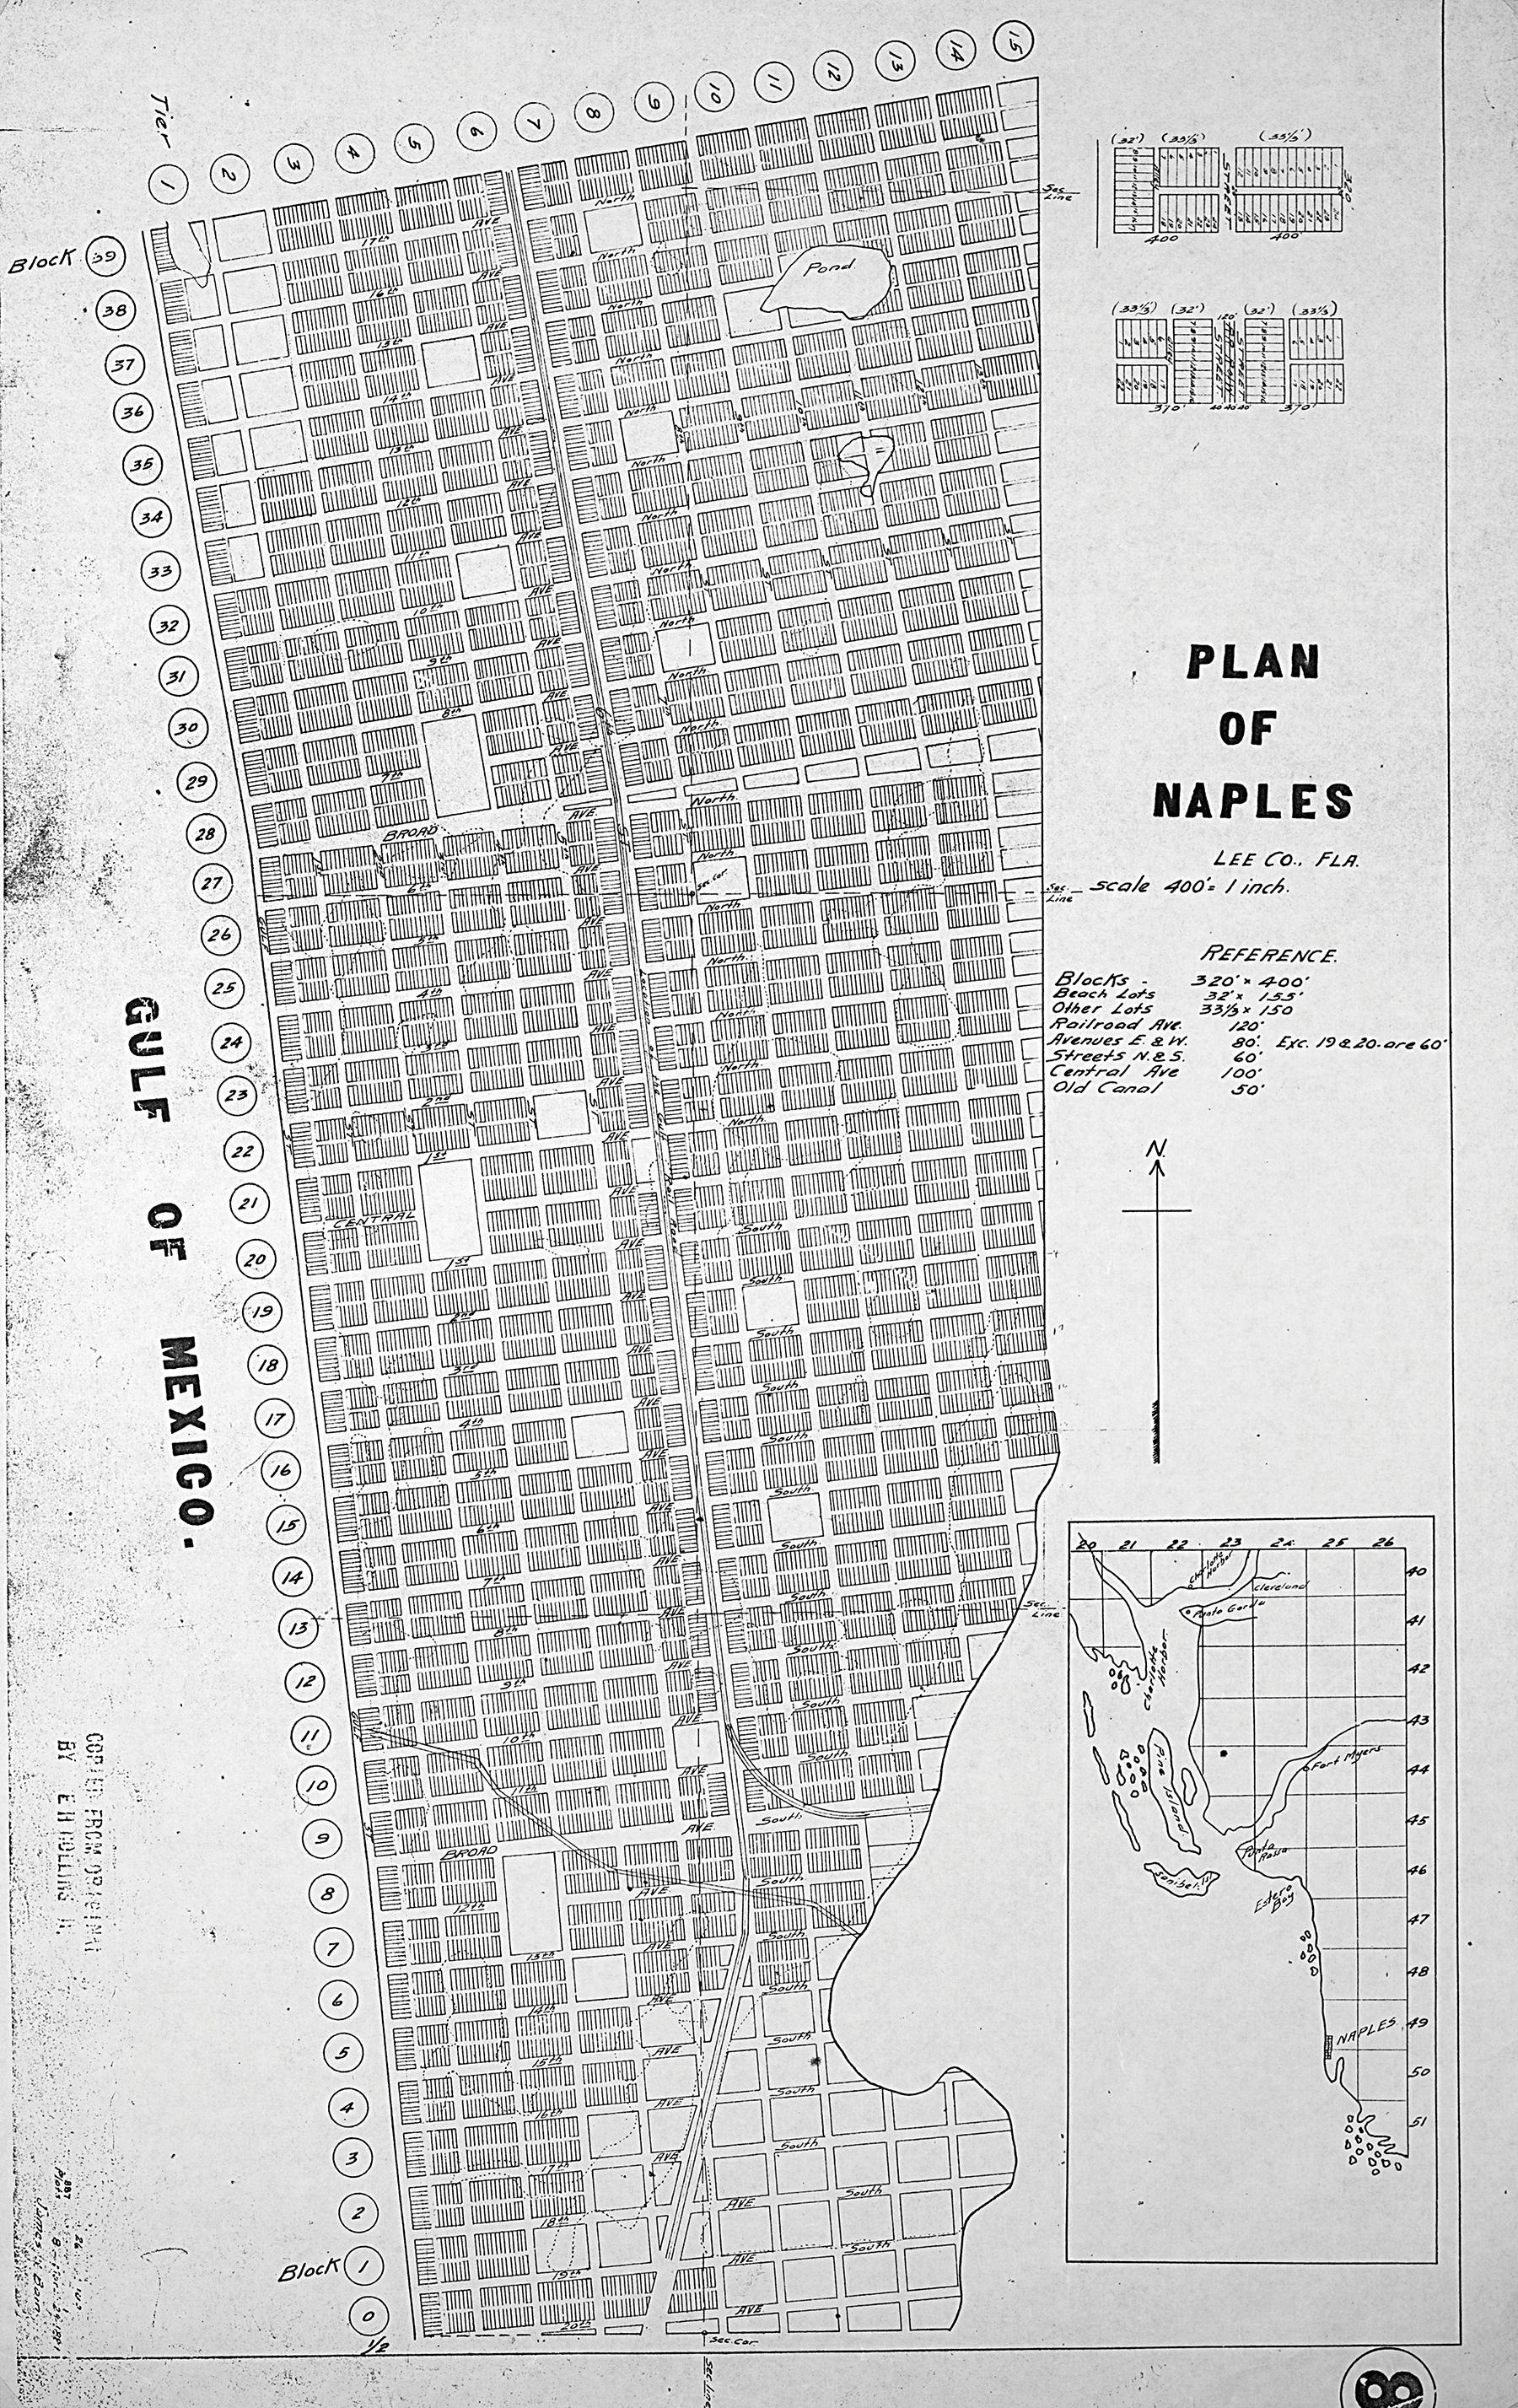 Plan of Naples, 1887